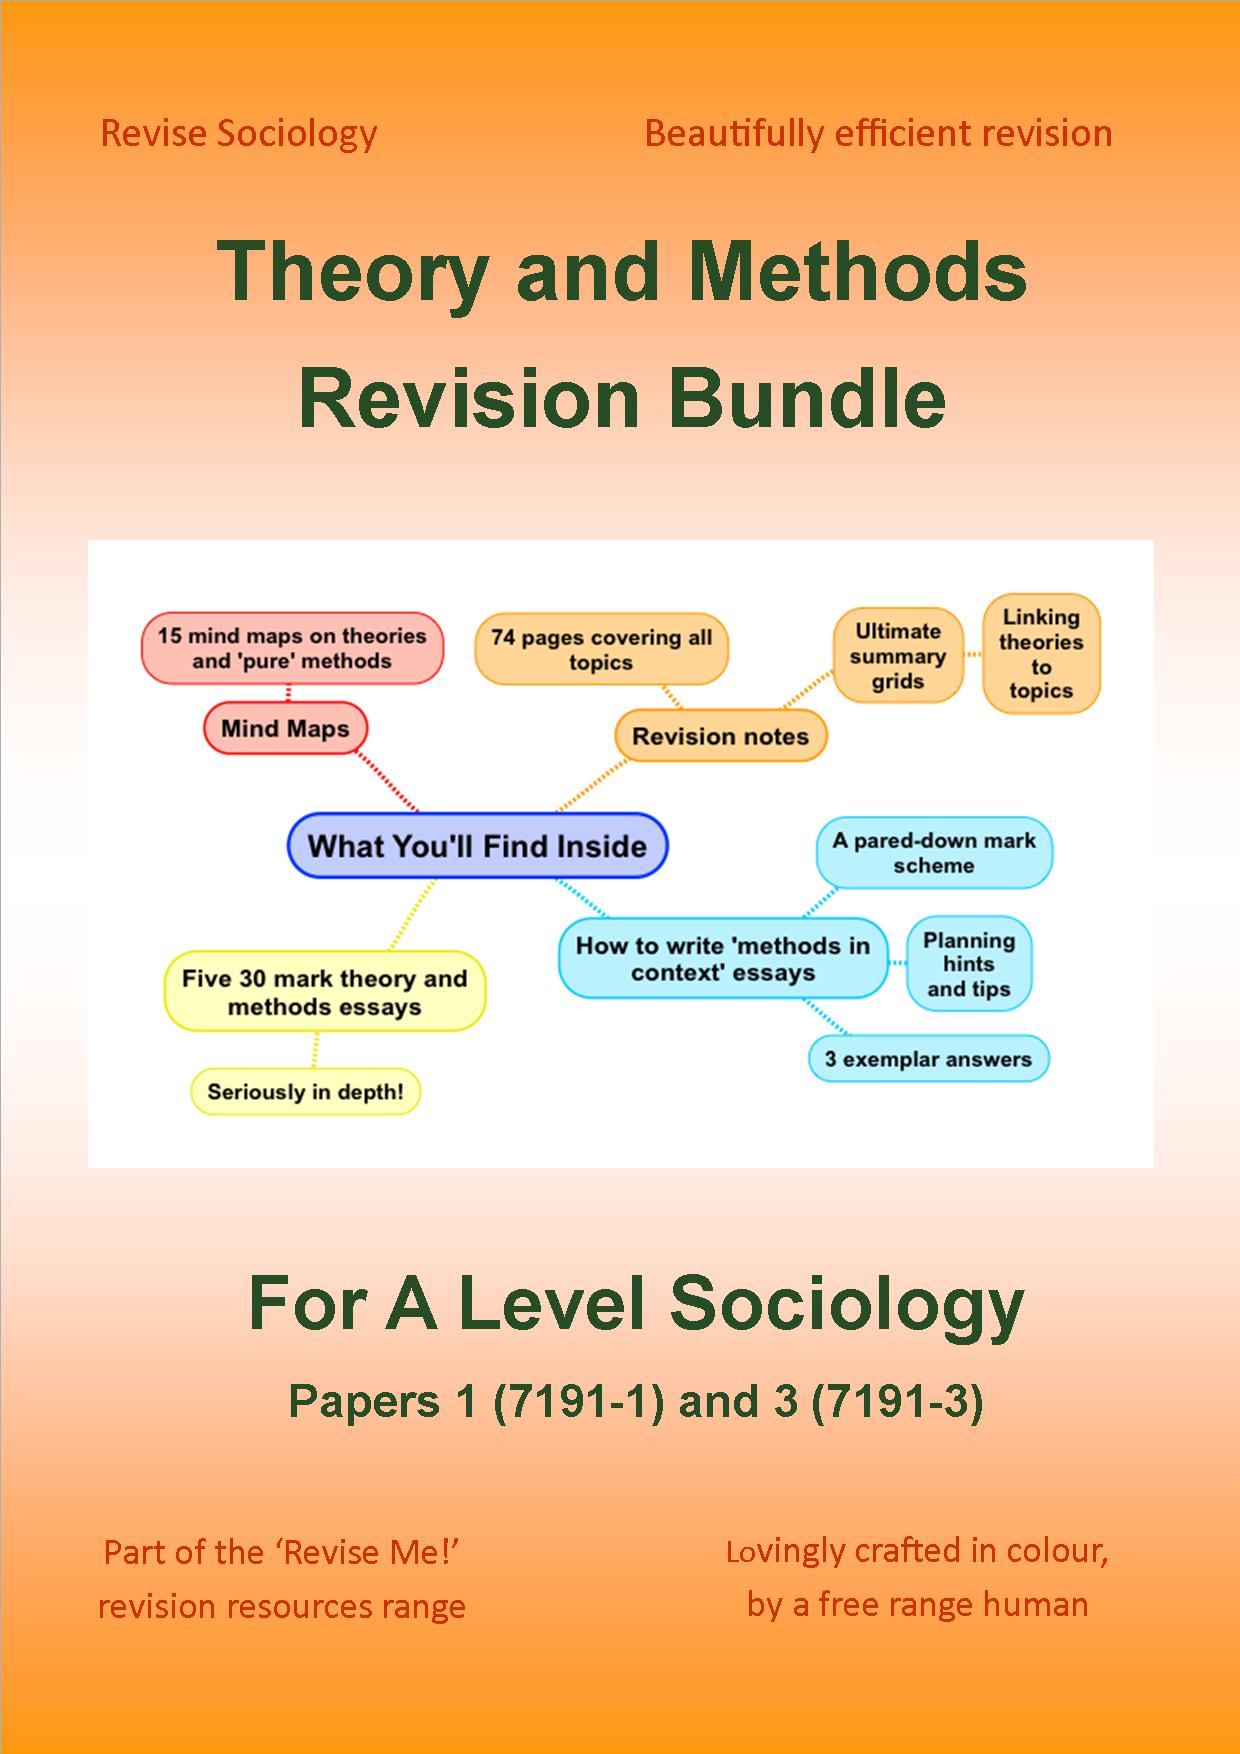 quantitative and qualitative research methods in sociology